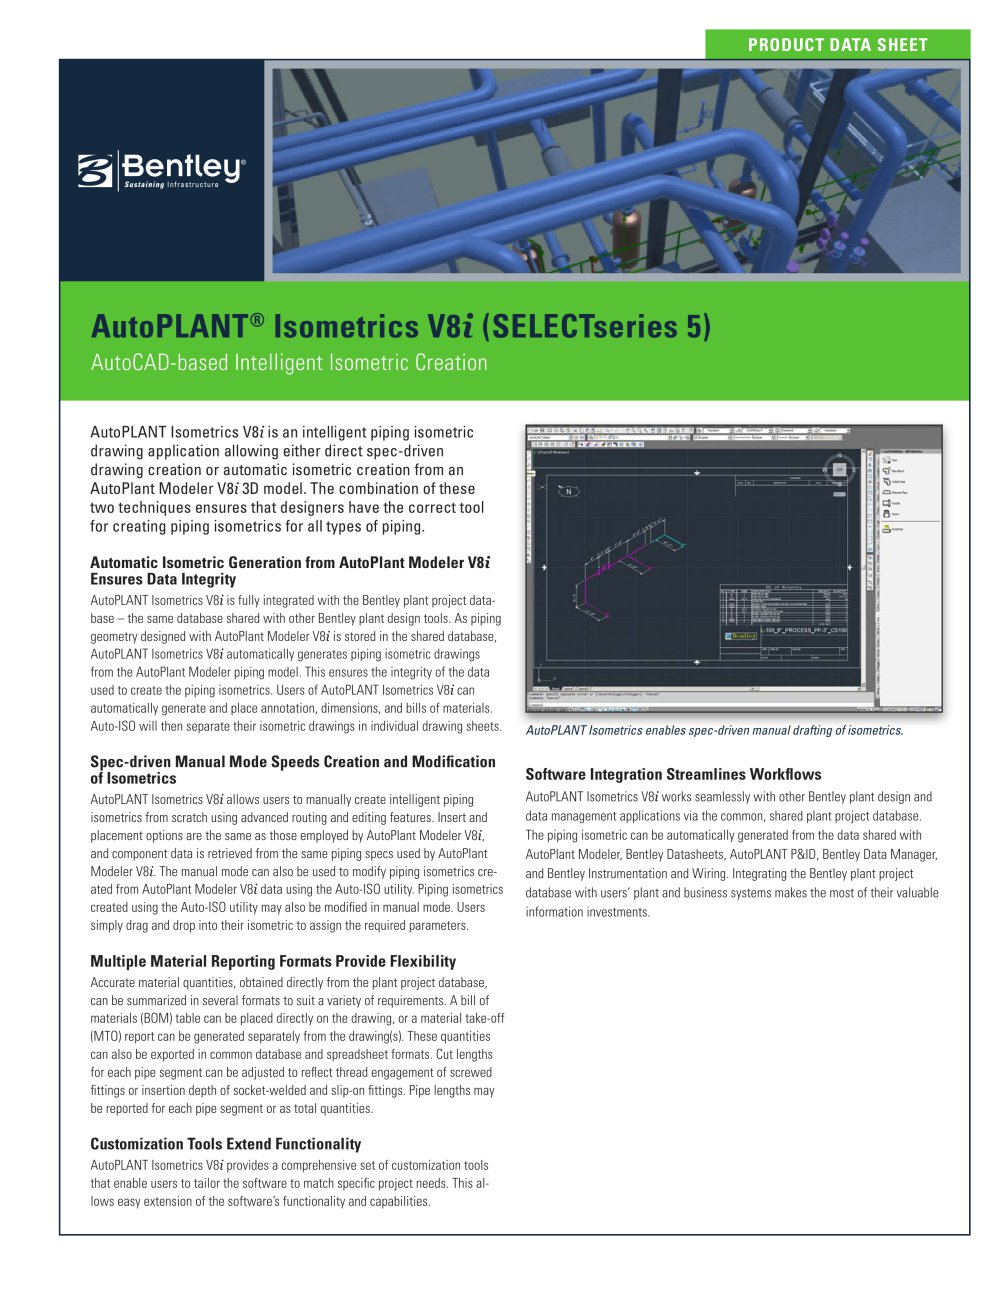 AutoPLANT Isometrics V8i - 1 / 2 Pages